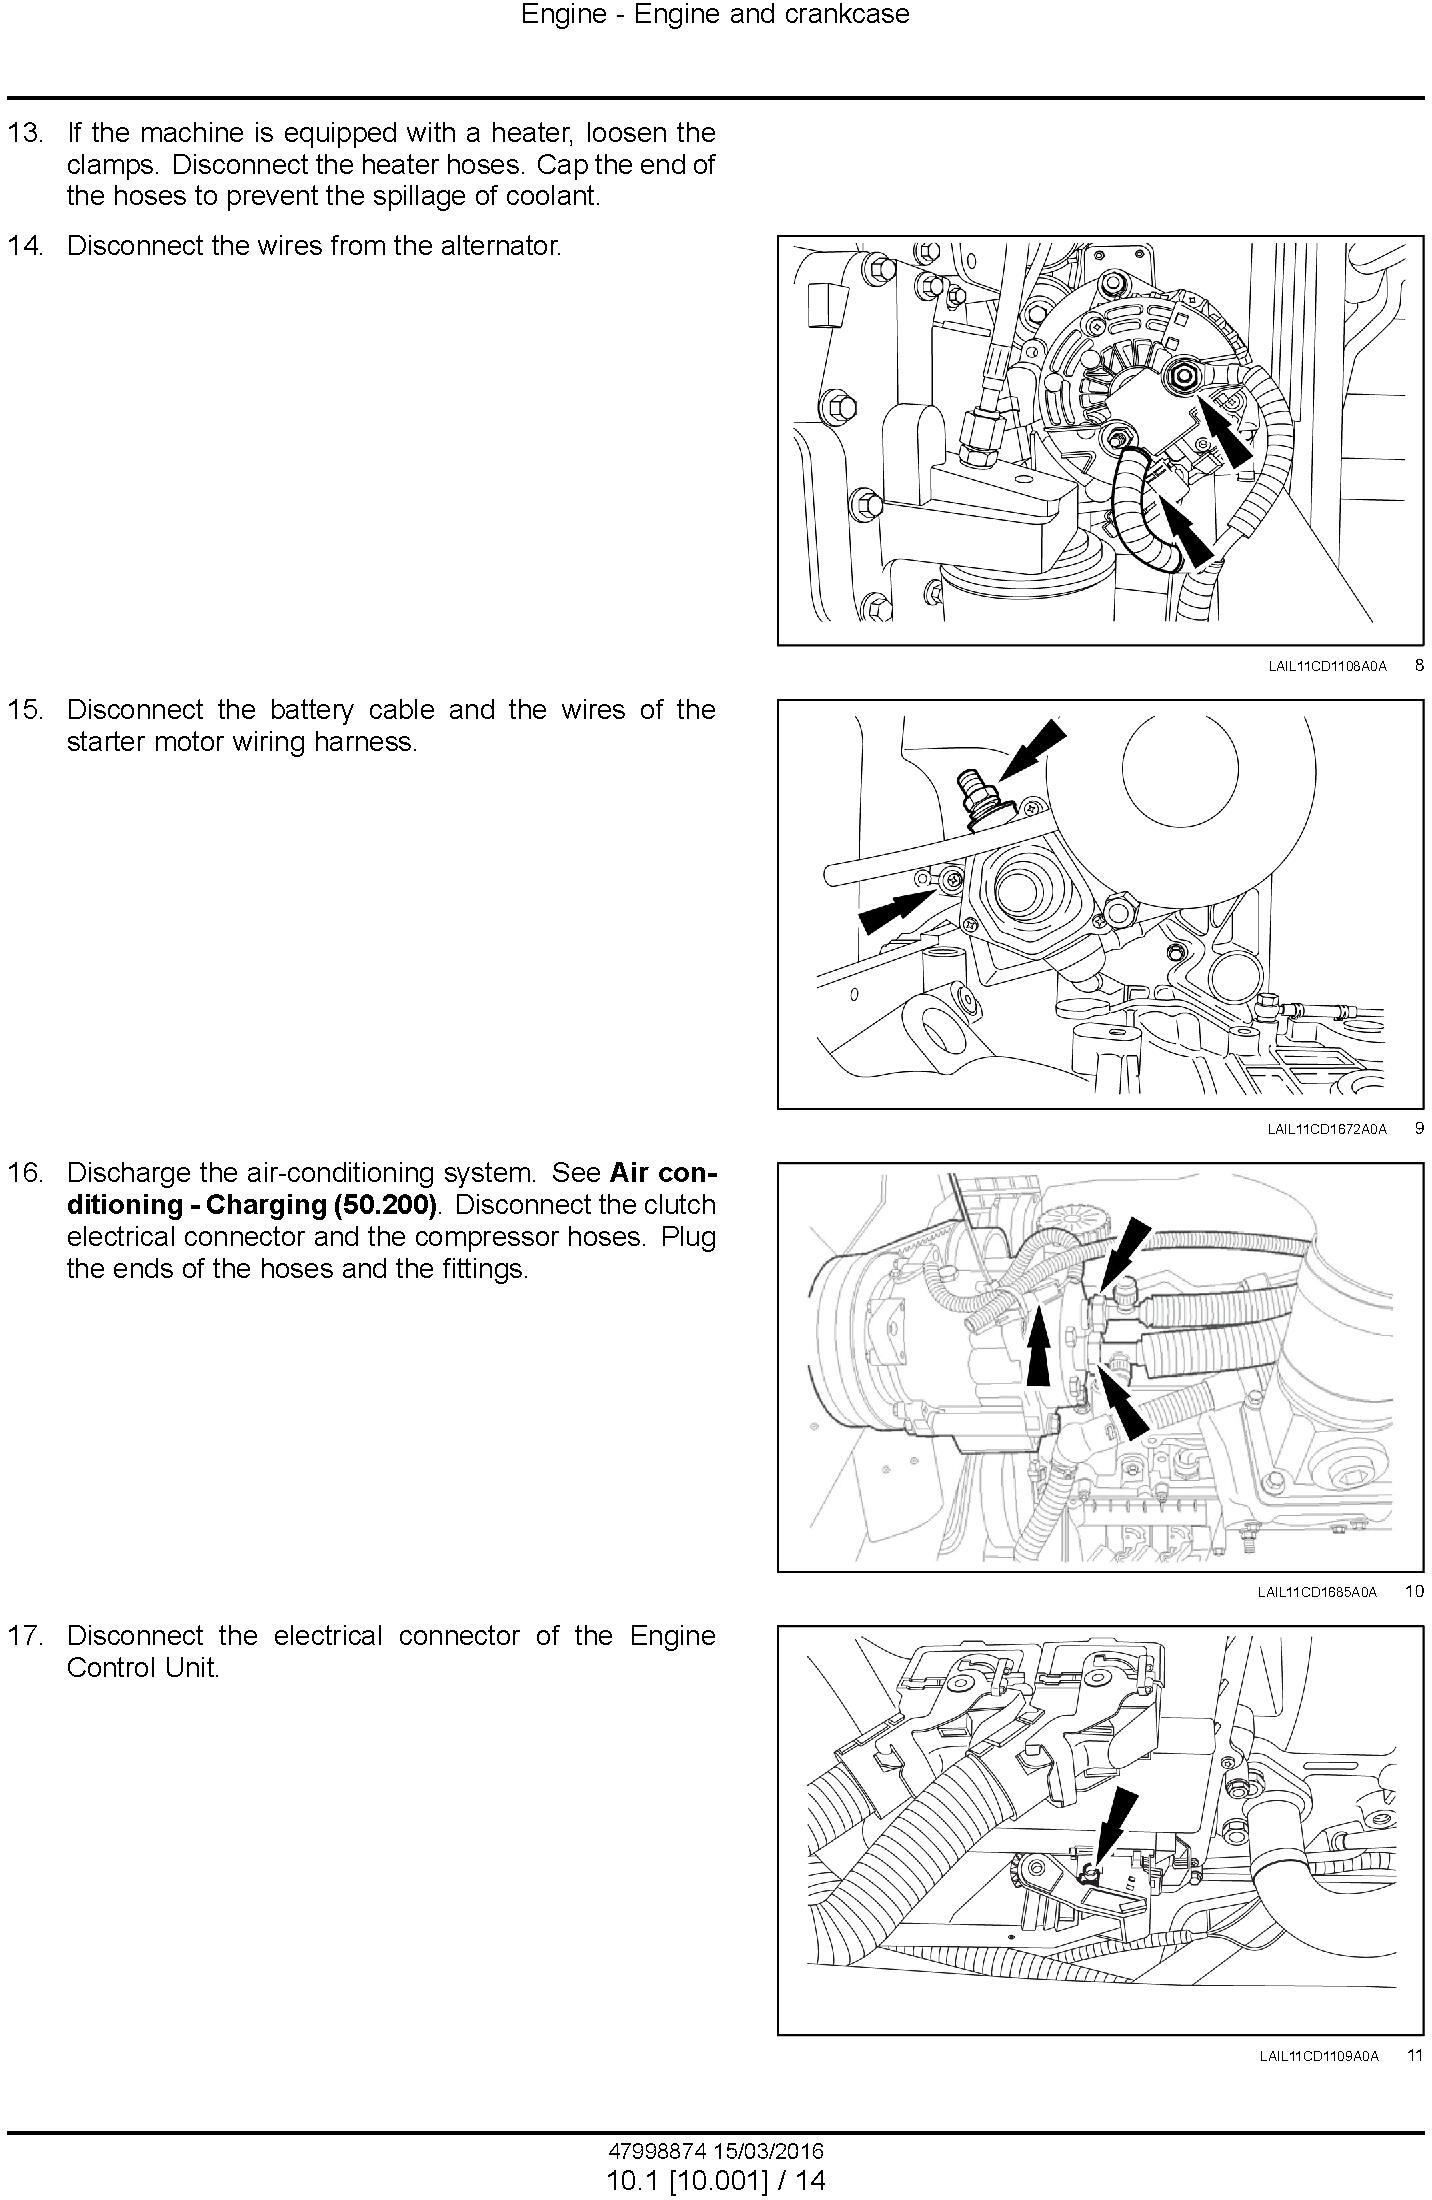 New Holland , Case 1150L Crawler dozer Service Manual - 2